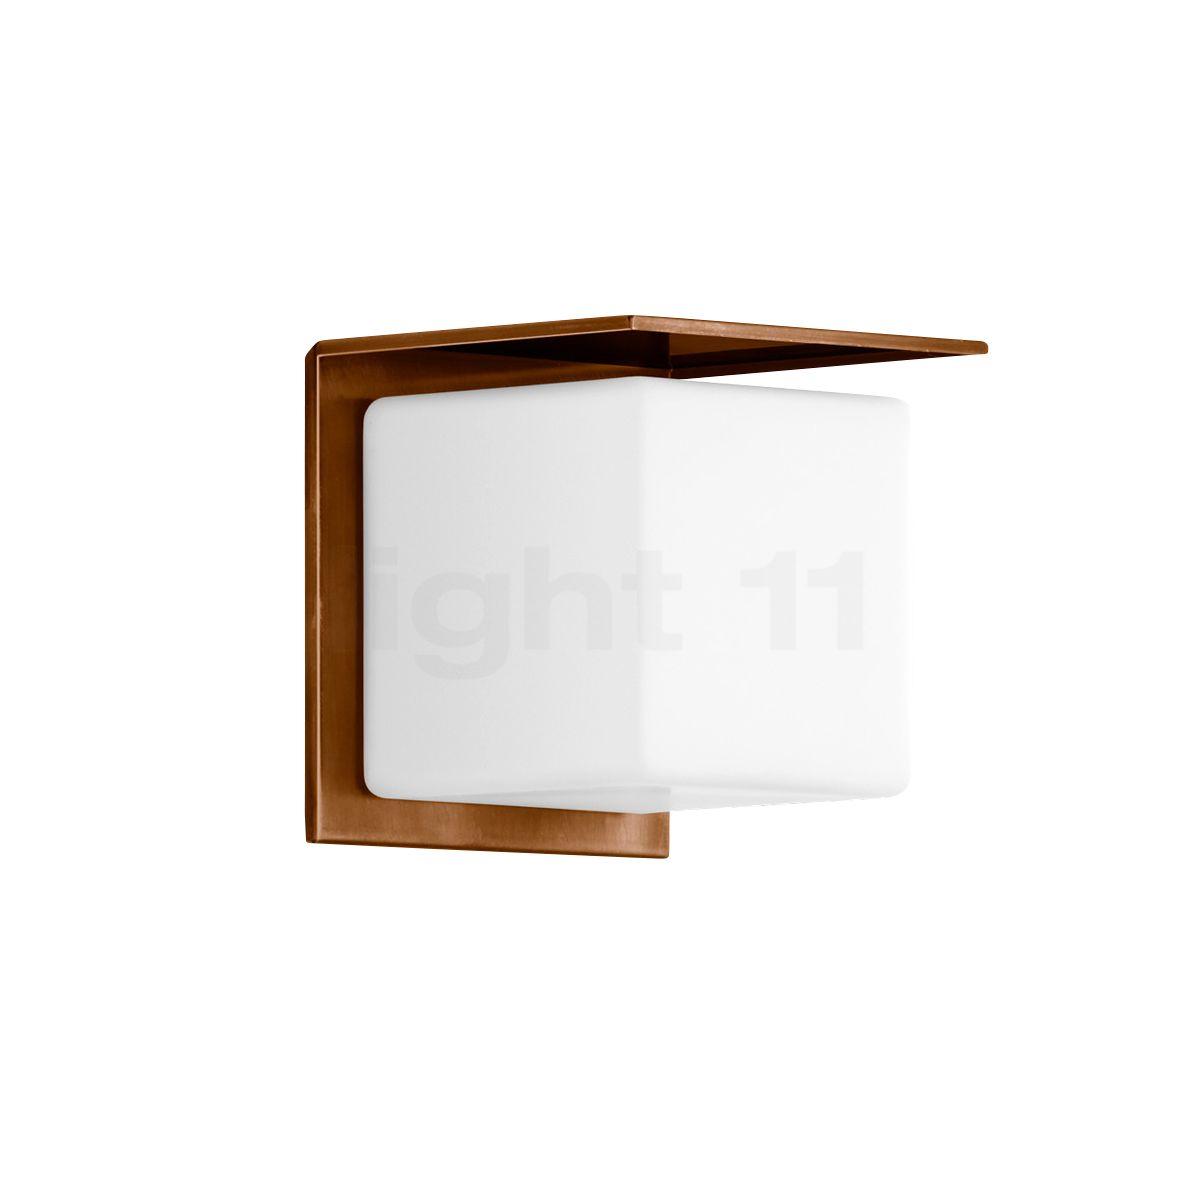 bega 1311 wandleuchte wandleuchte kaufen bei. Black Bedroom Furniture Sets. Home Design Ideas